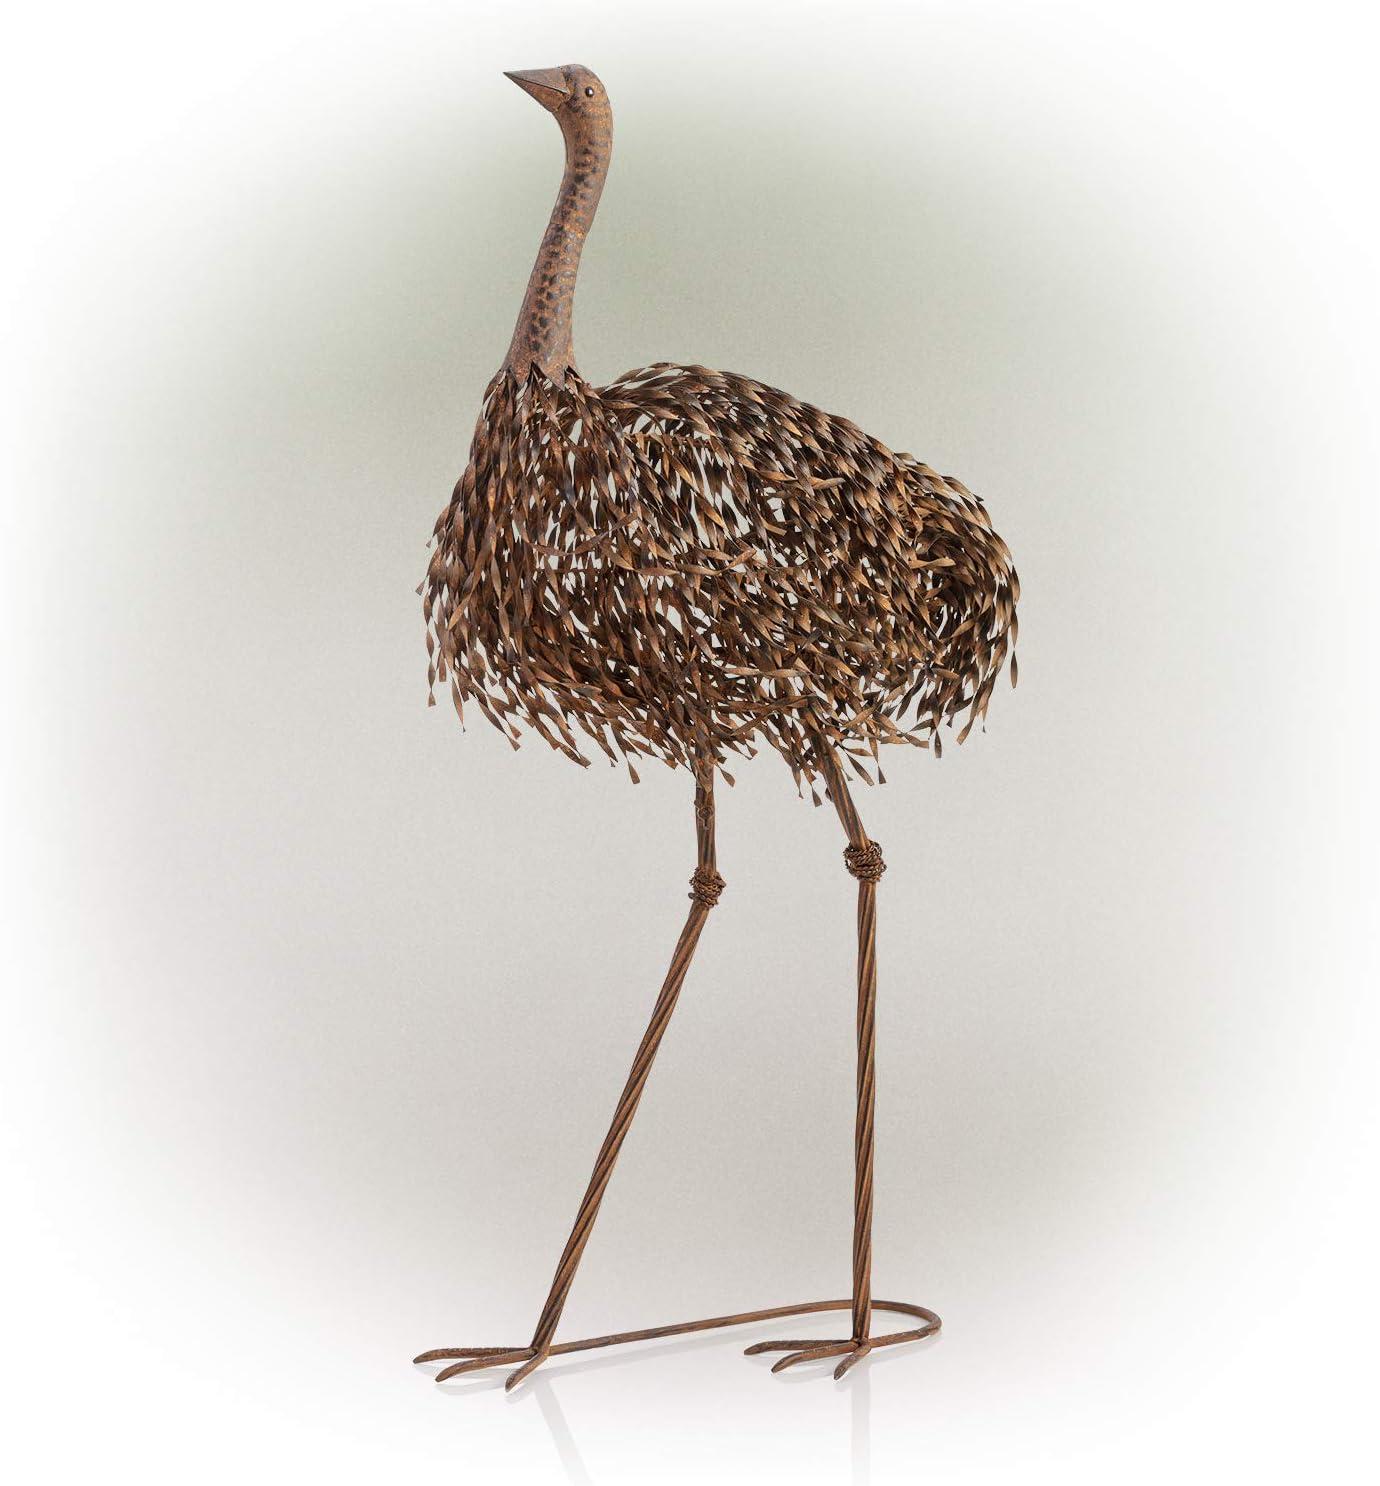 Medium Tall Recycled Metal Ostrich Planter